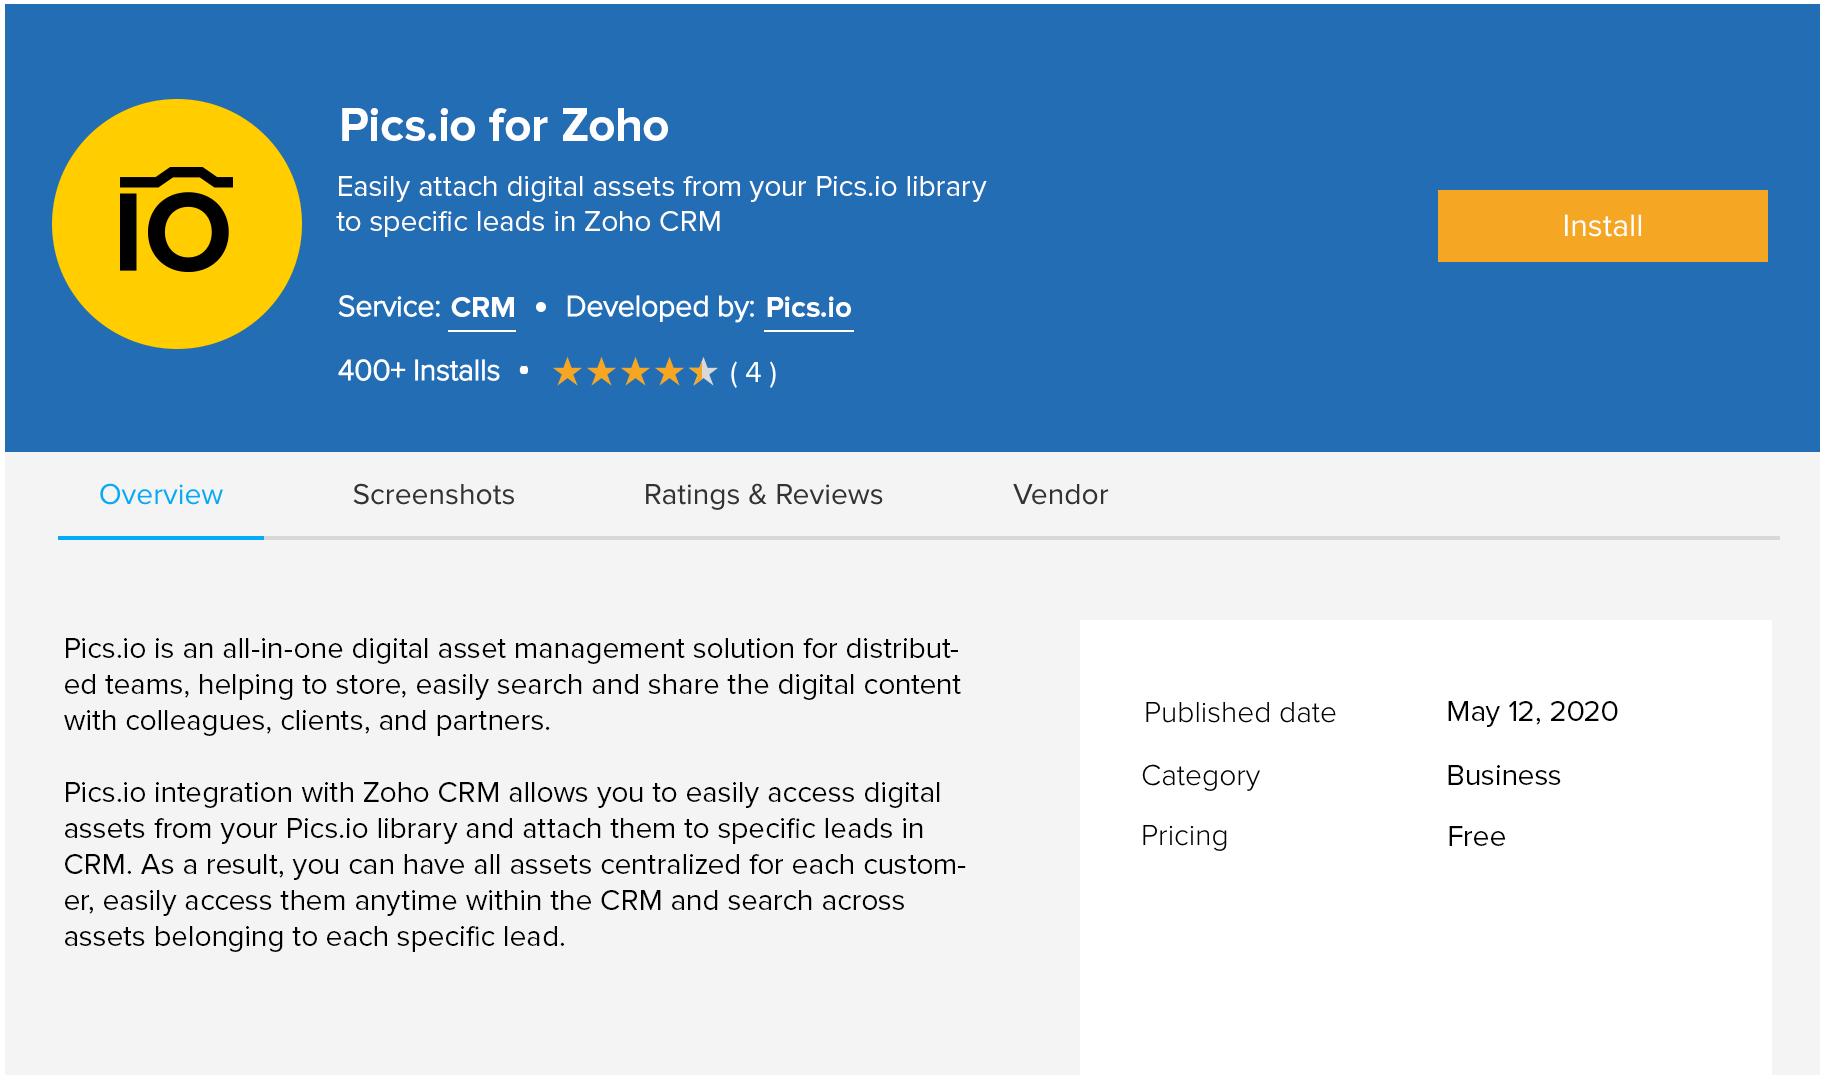 Pics.io plugin for Zoho